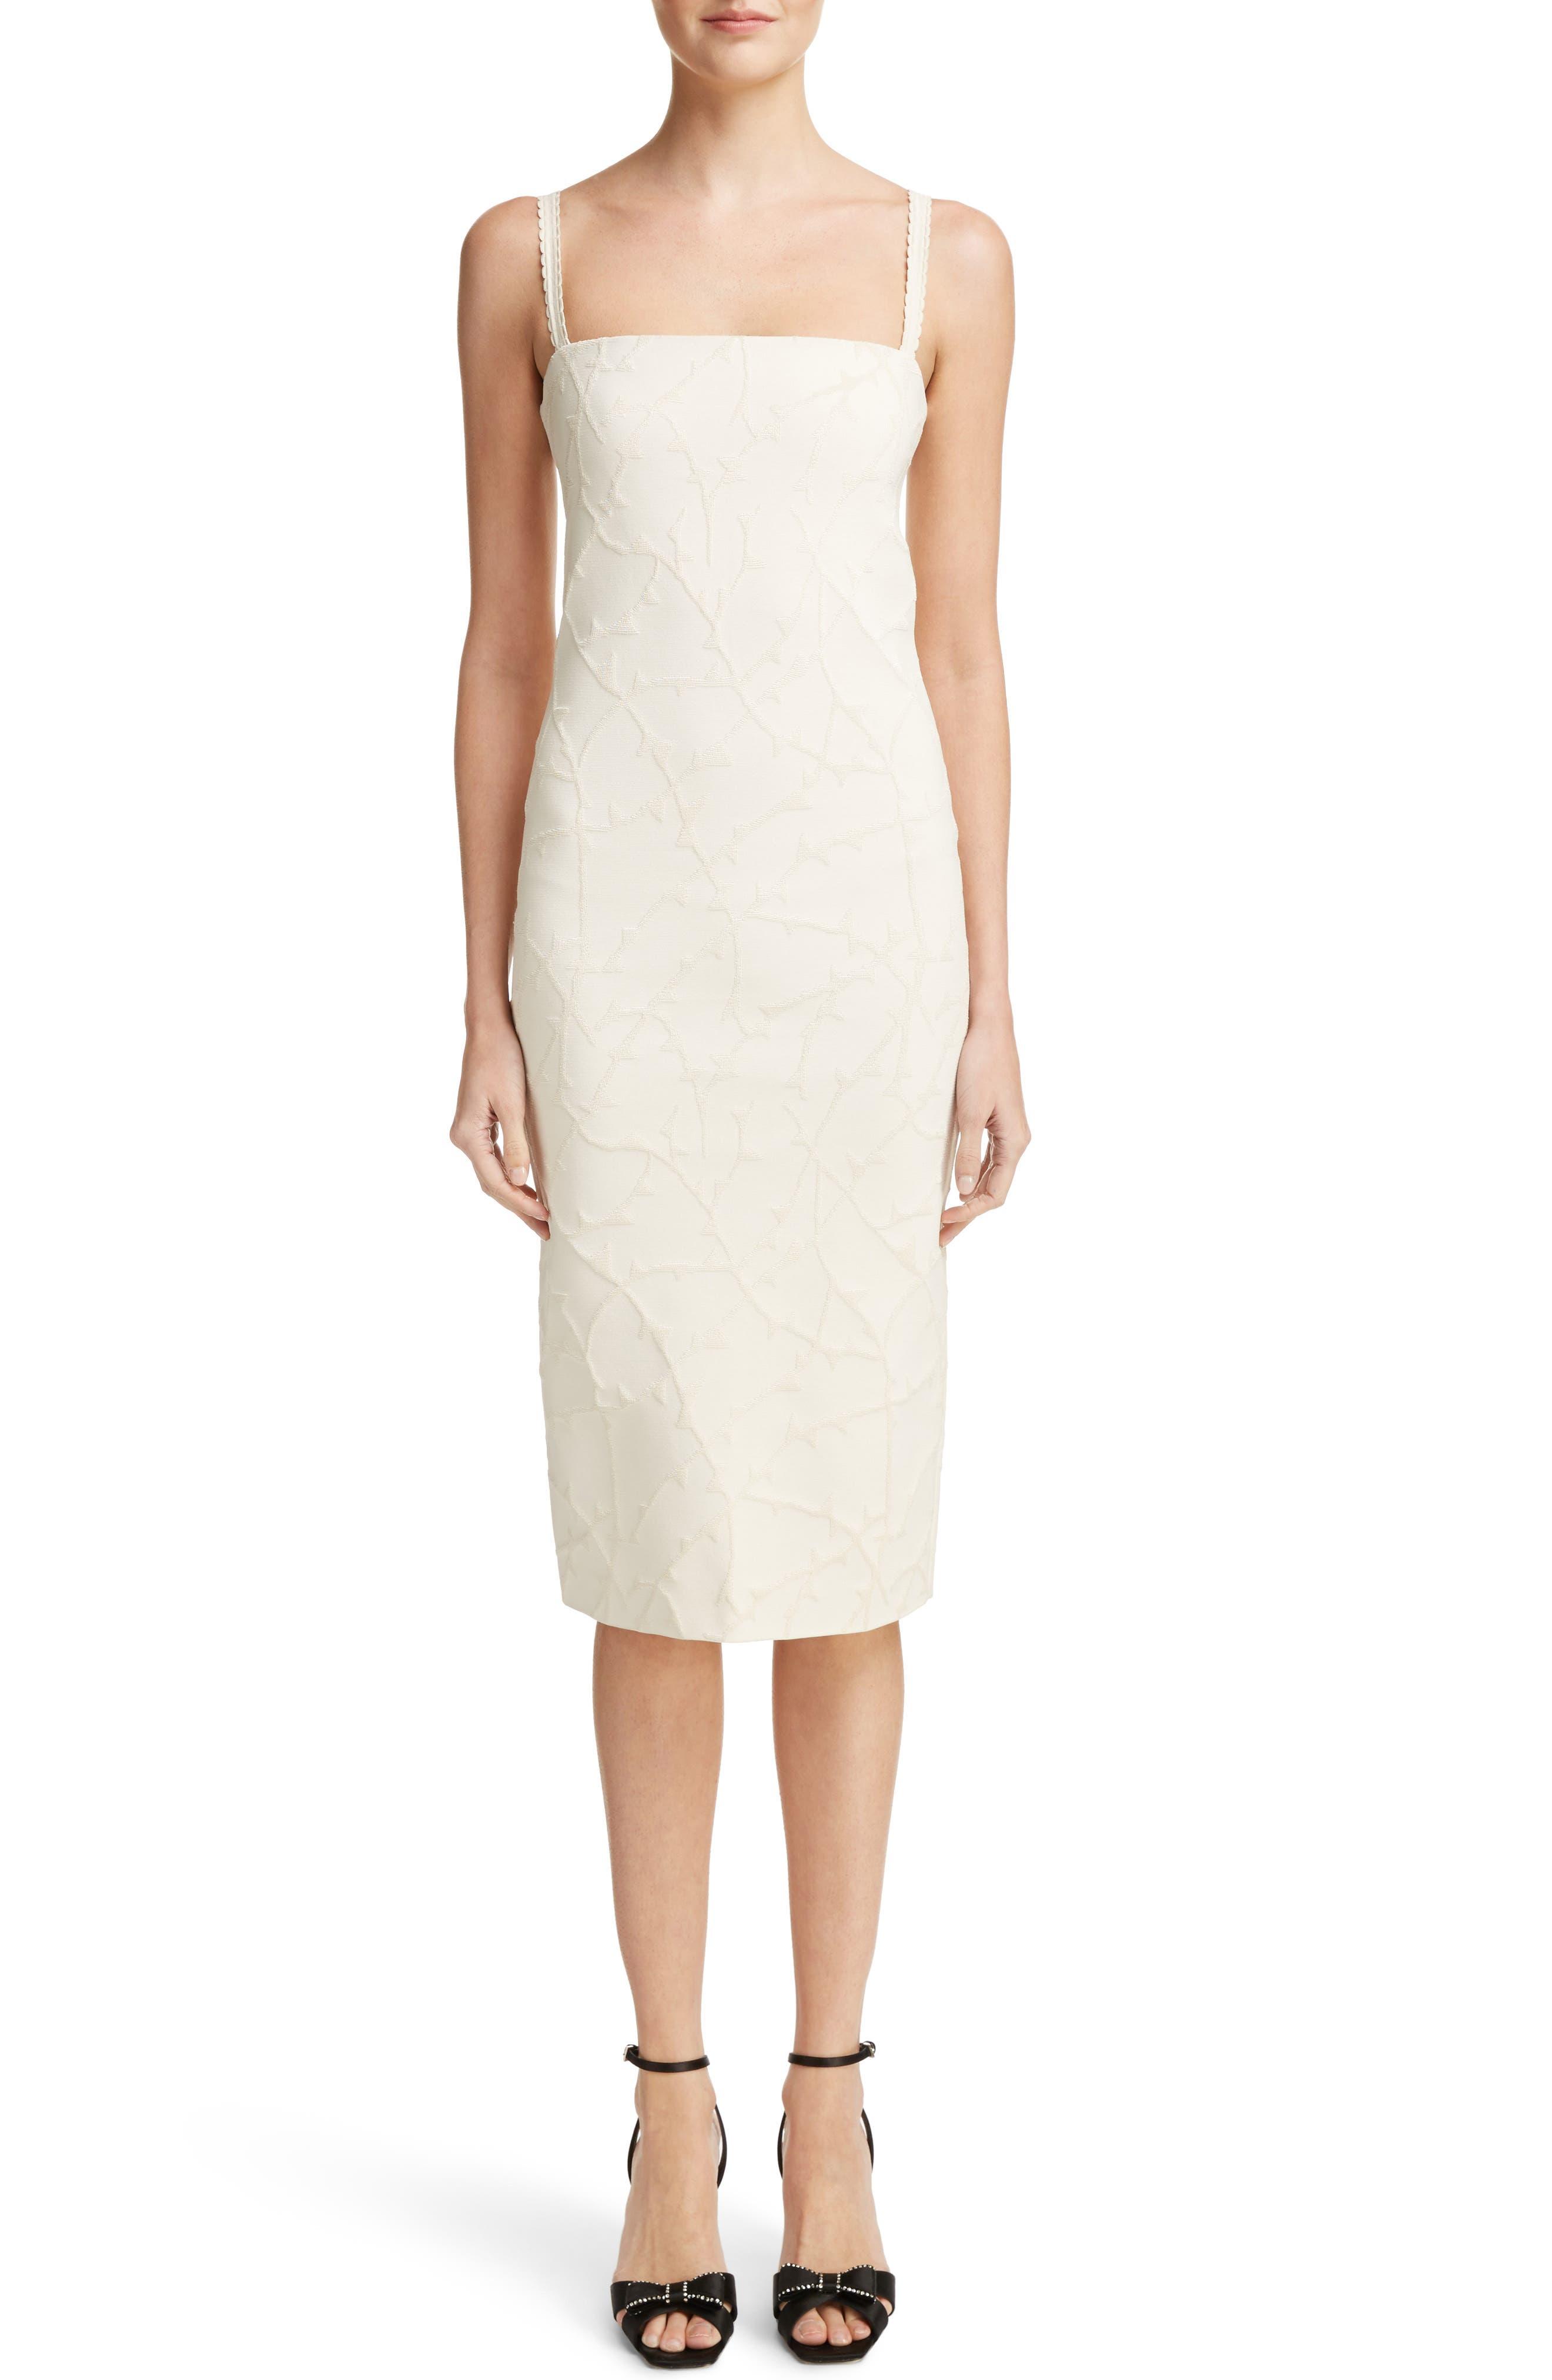 Jacquard Knit Dress,                         Main,                         color, Off White